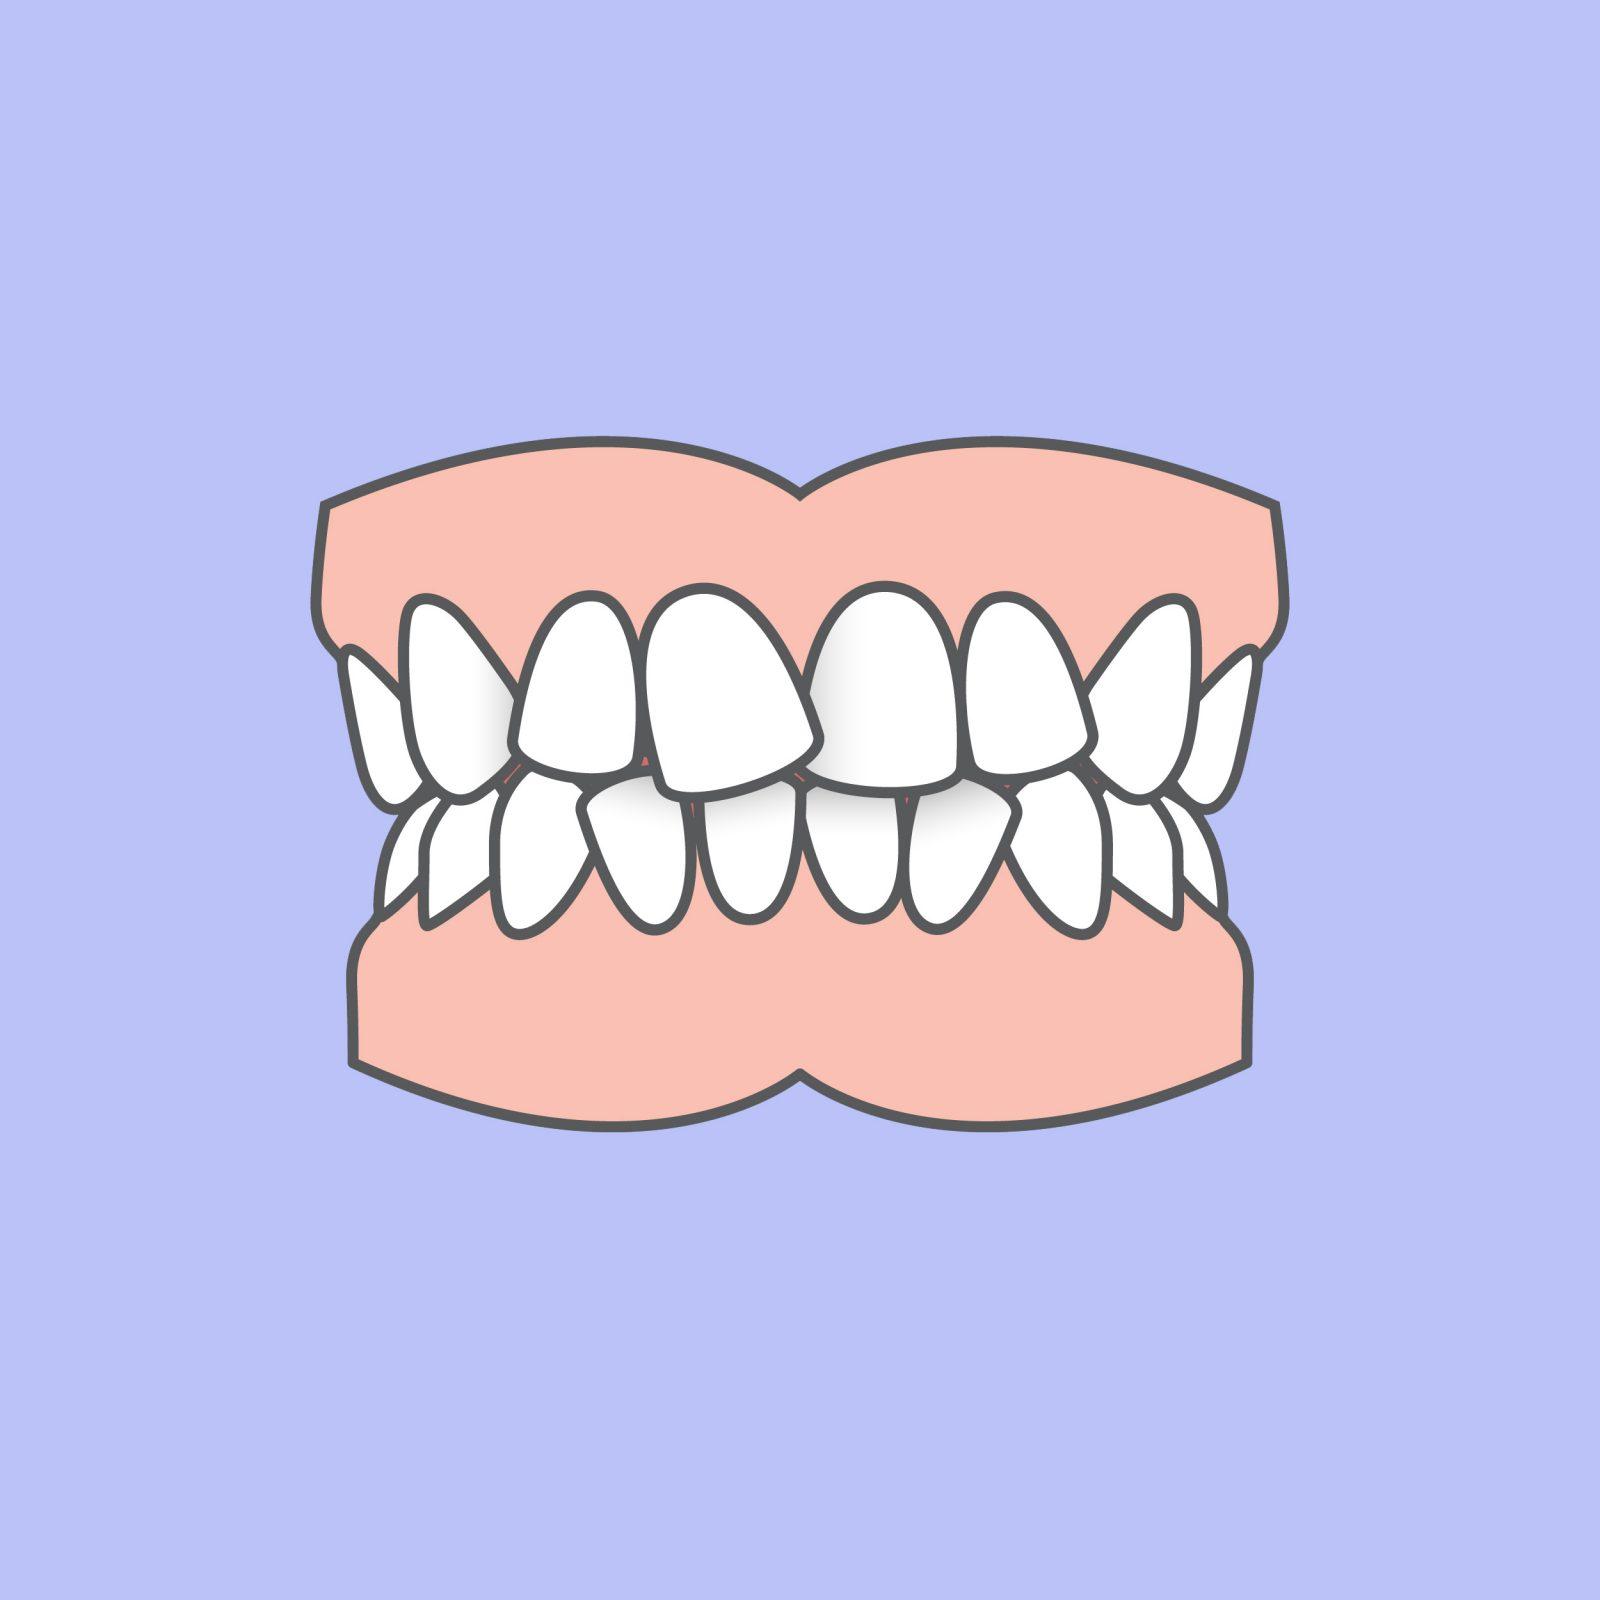 Odontia Tannlegene: Trangstilling